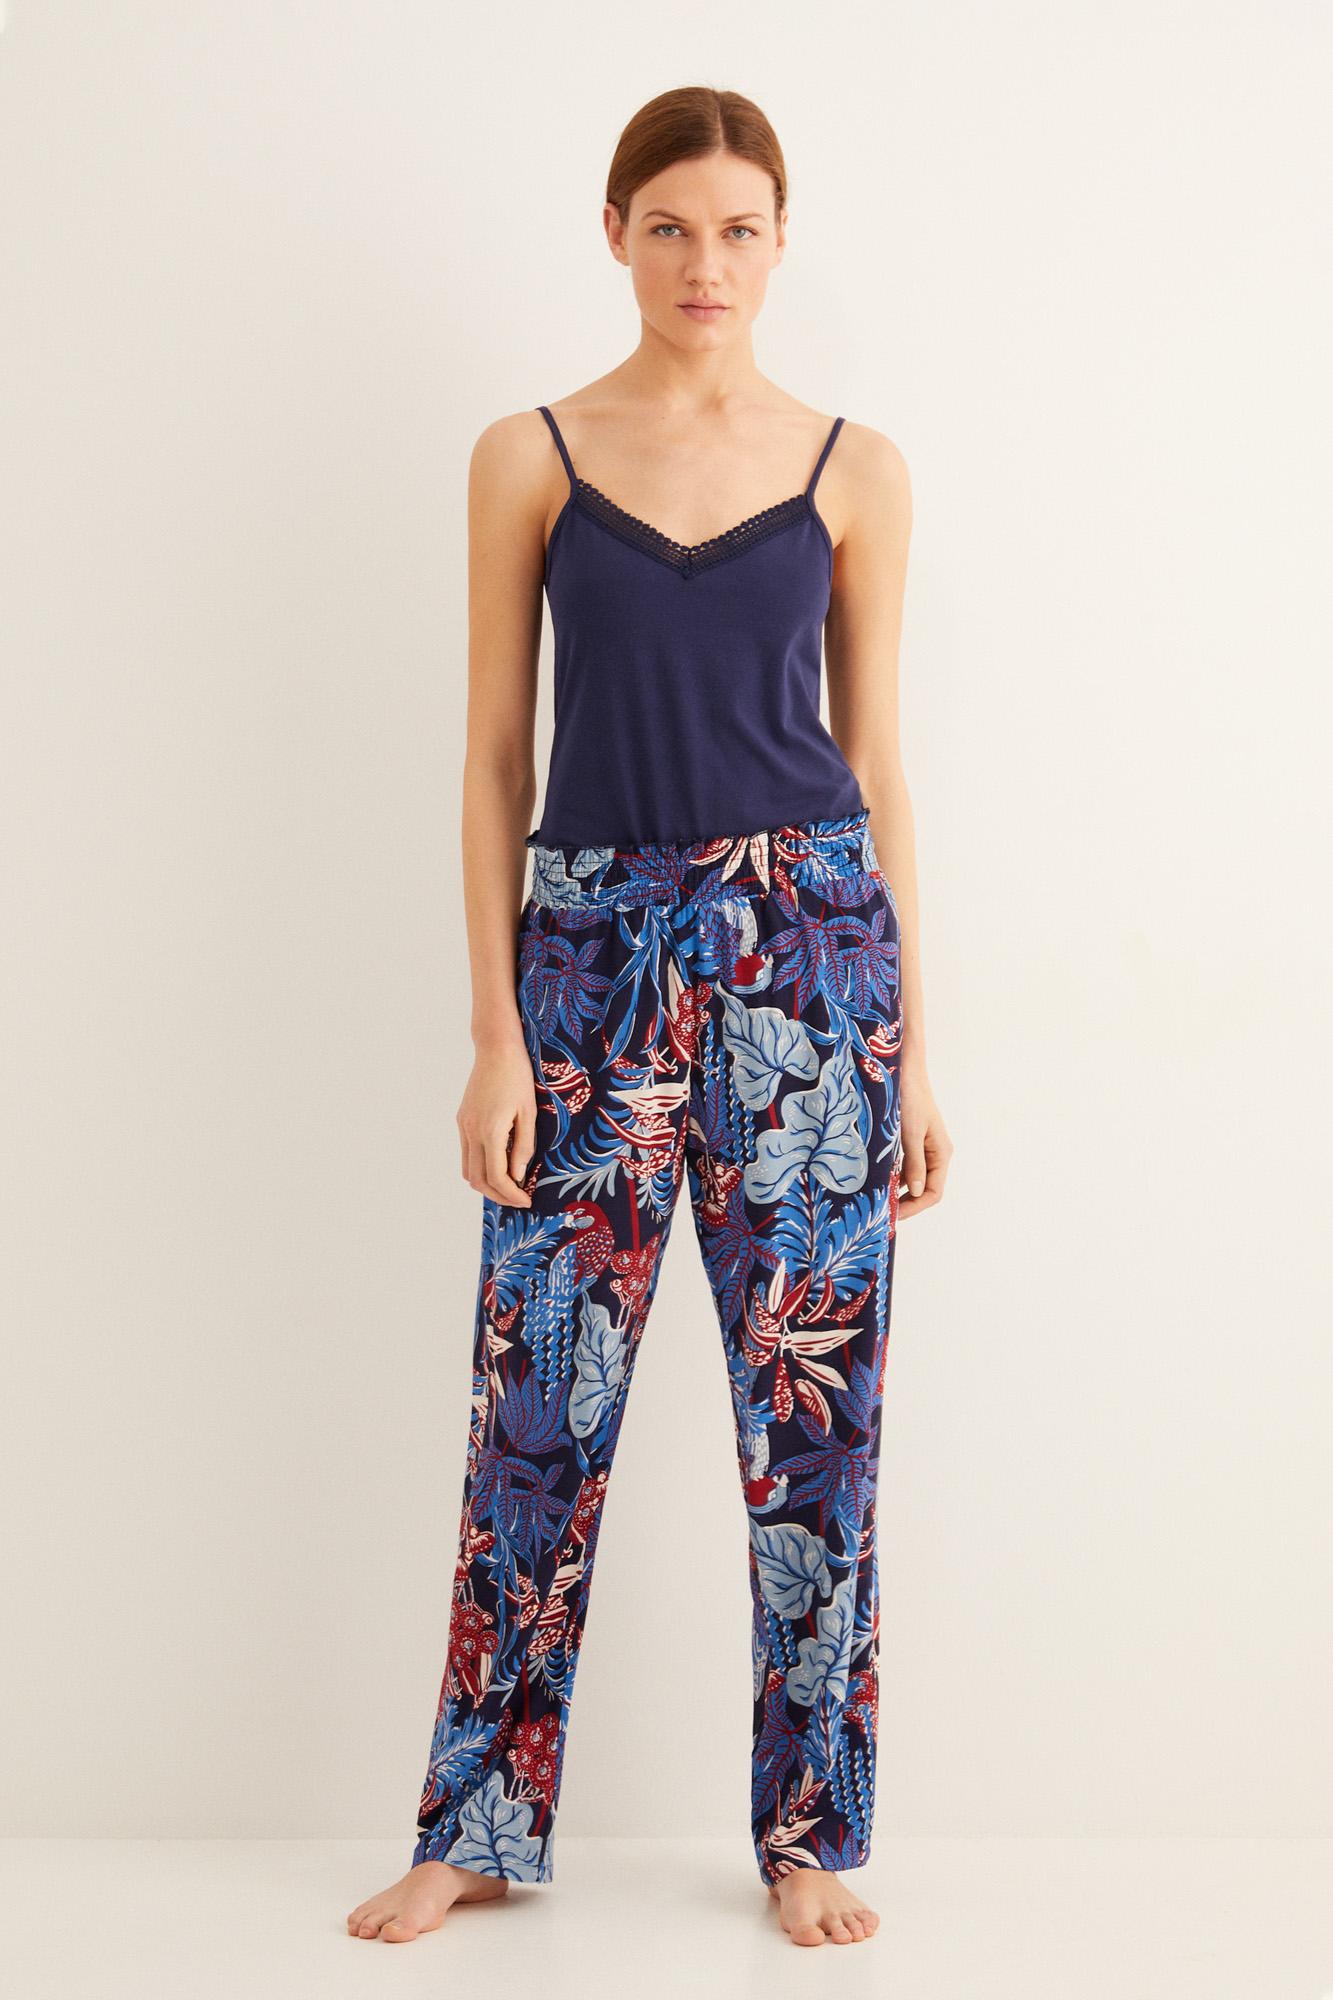 Pantalón pijama largo estampado   Pantalones   Women'secret